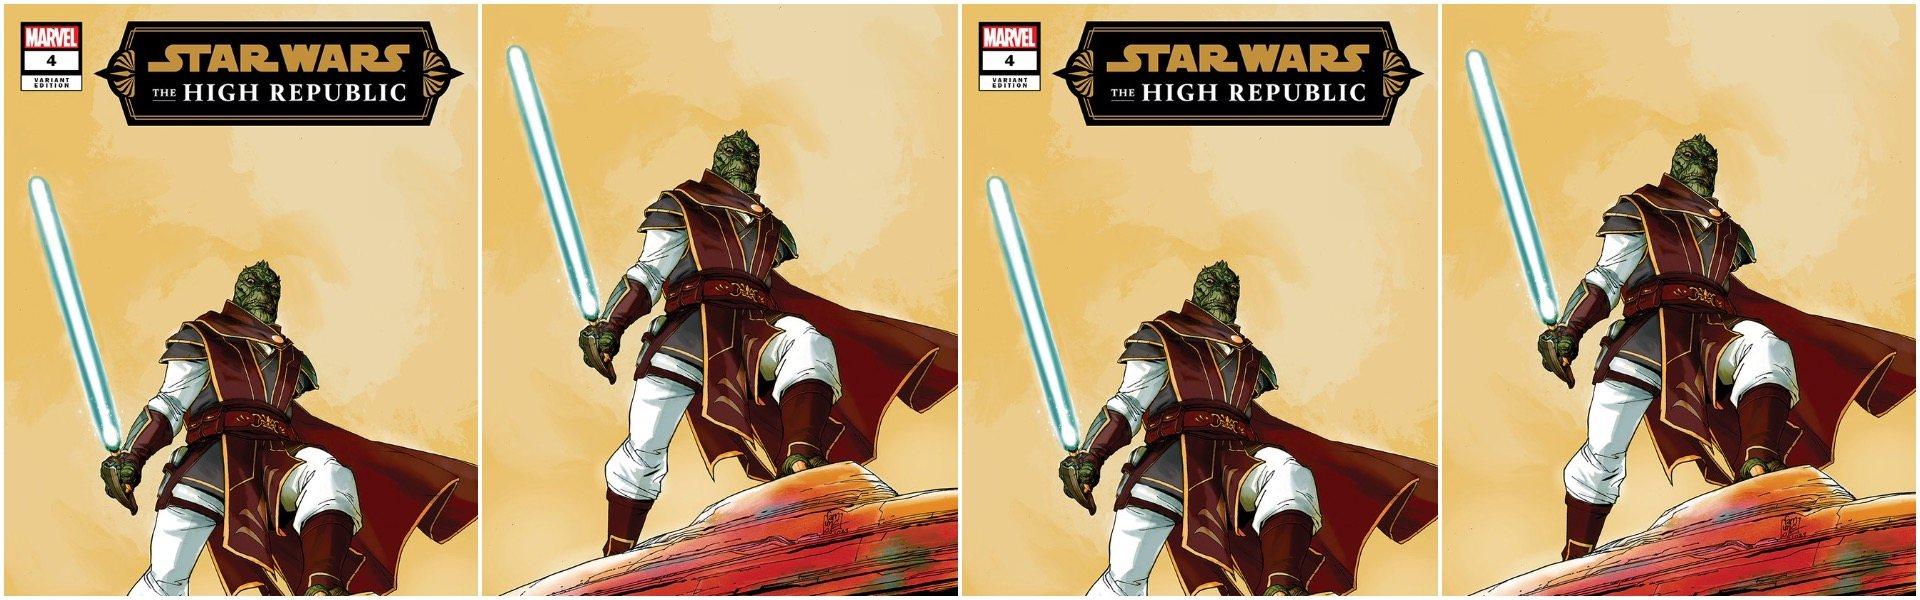 Star Wars High Republic #4 Giuseppe Camuncoli Variants